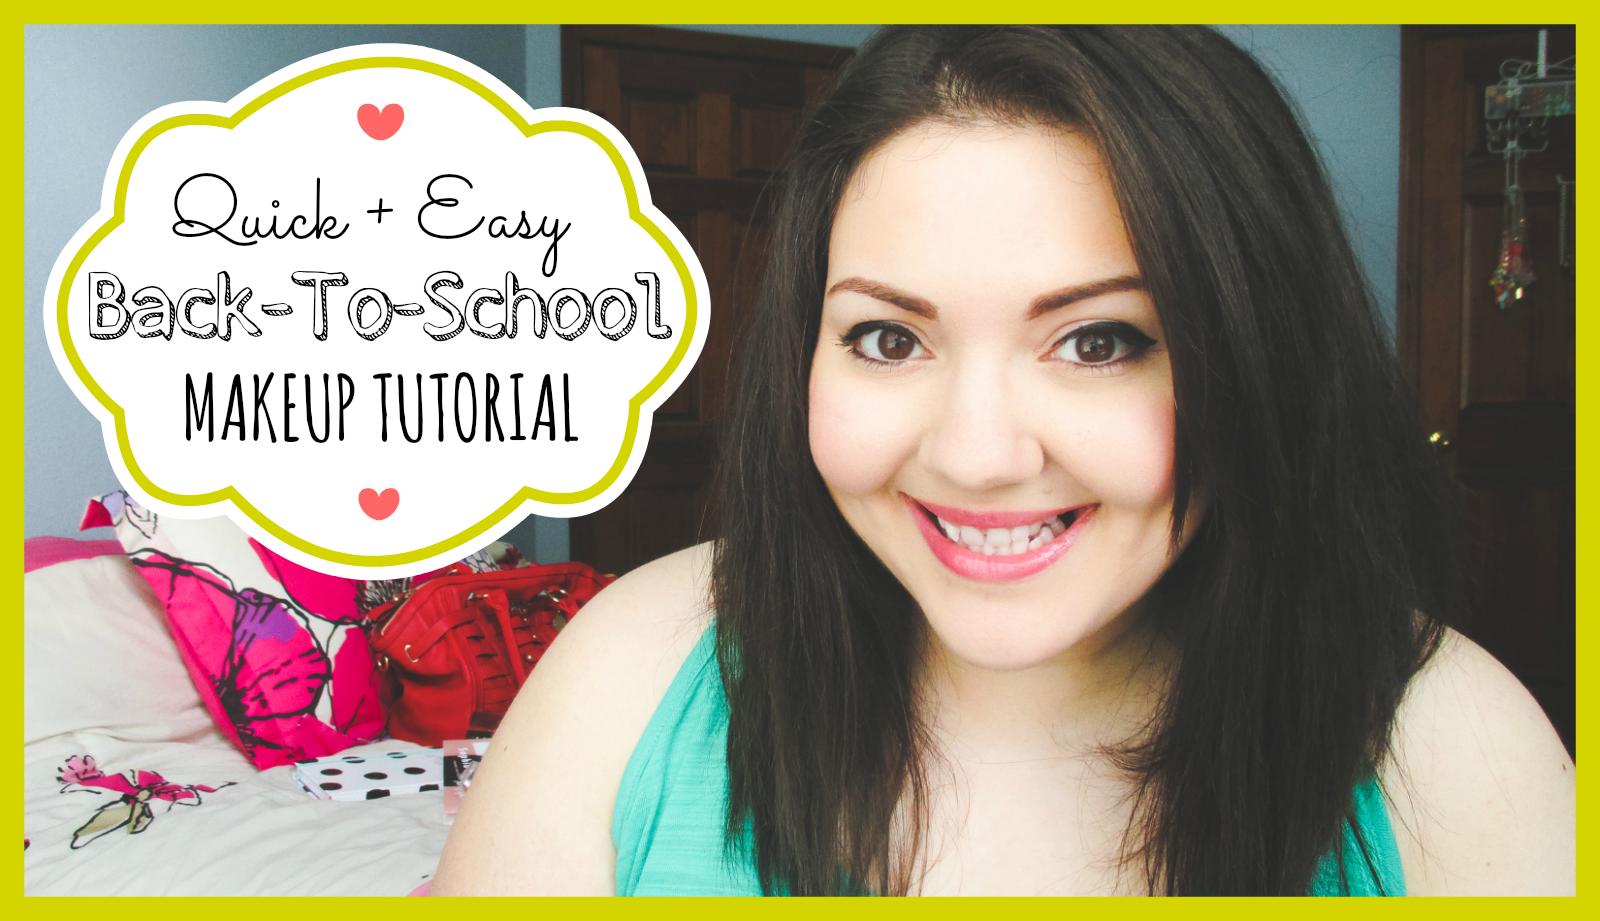 Quick + Easy Back-To-School Makeup Tutorial